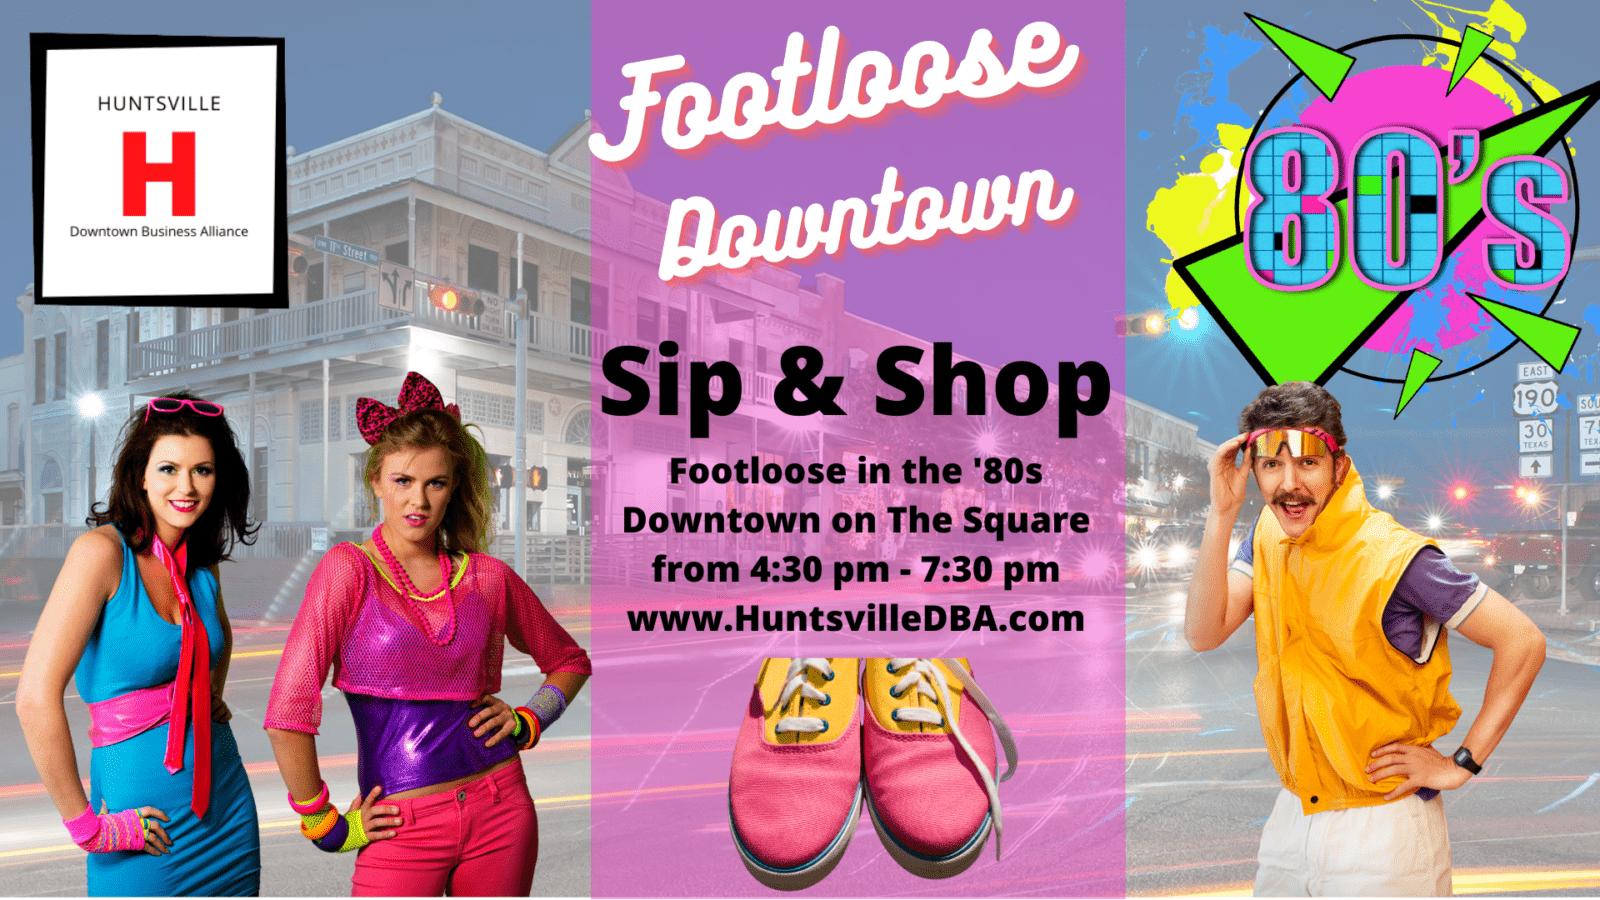 Sip & Shop Footloose in the 80's